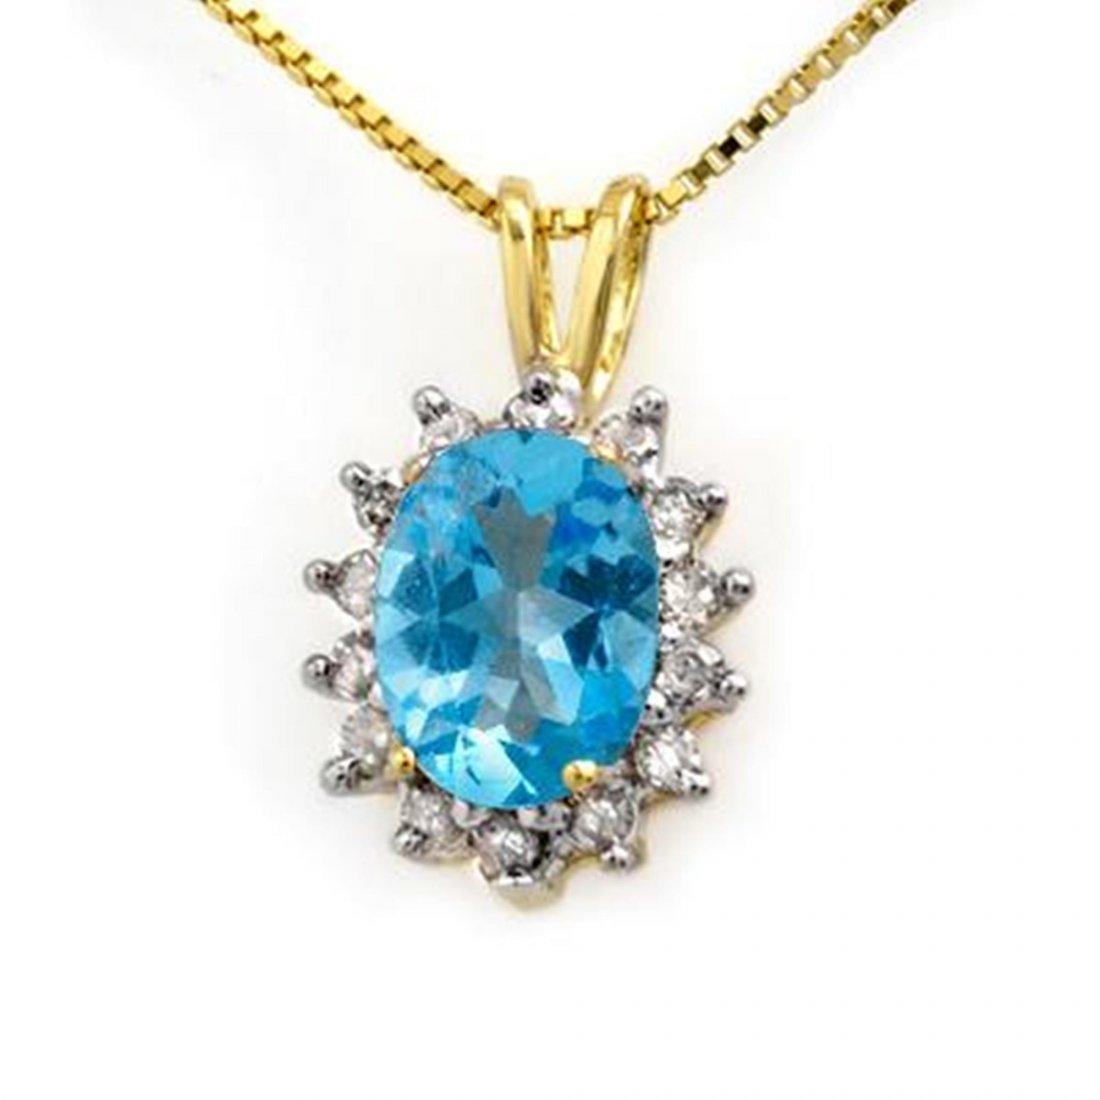 Genuine 1.0 ctw Blue Topaz & Diamond Pendant 10K Gold